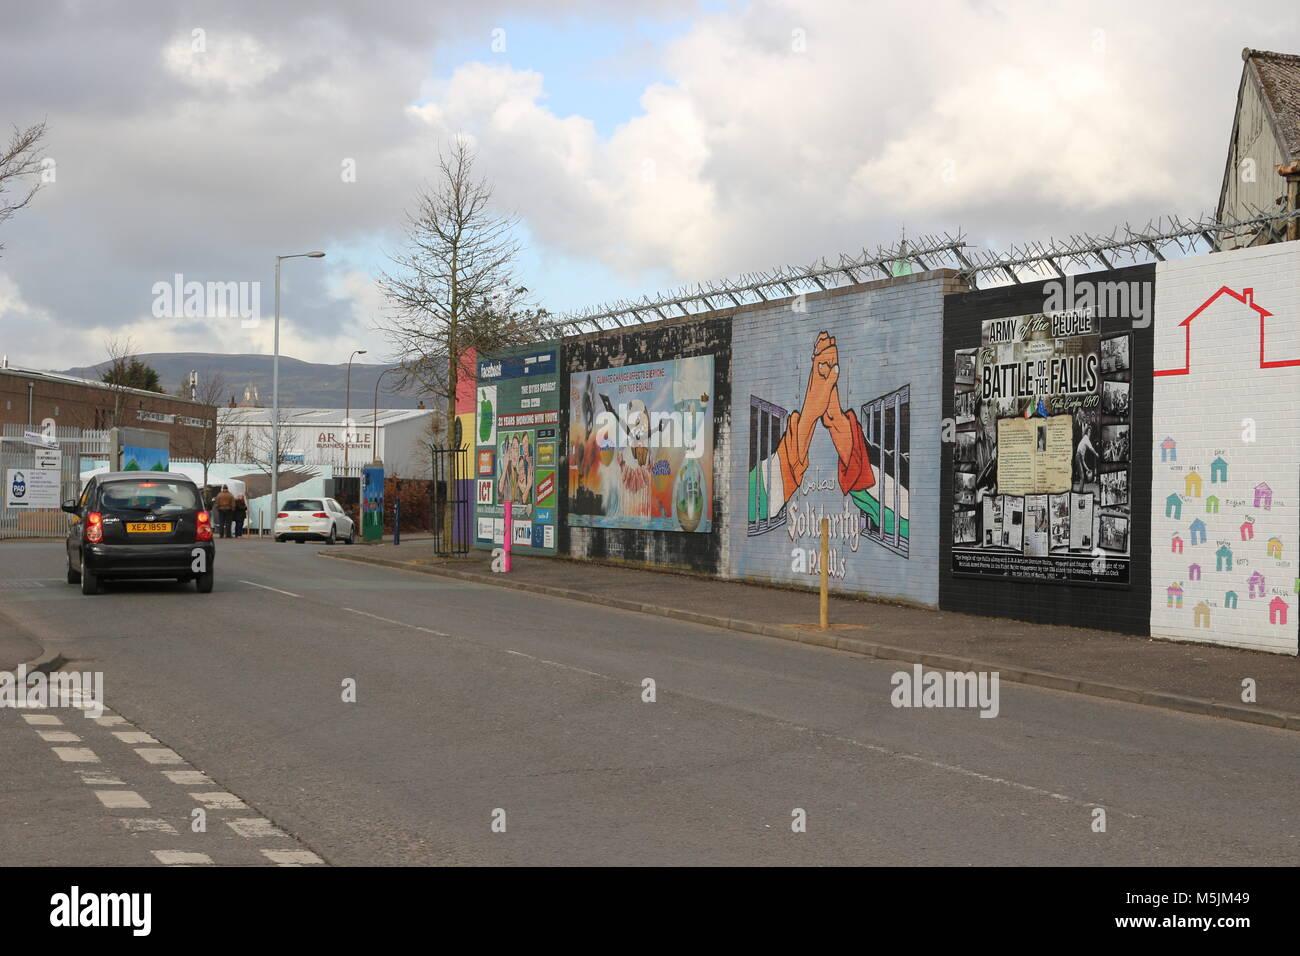 BELFAST, NORTHERN IRELAND - February 22 2018: Political mural in Belfast, Northern Ireland. Falls Road is famous Stock Photo